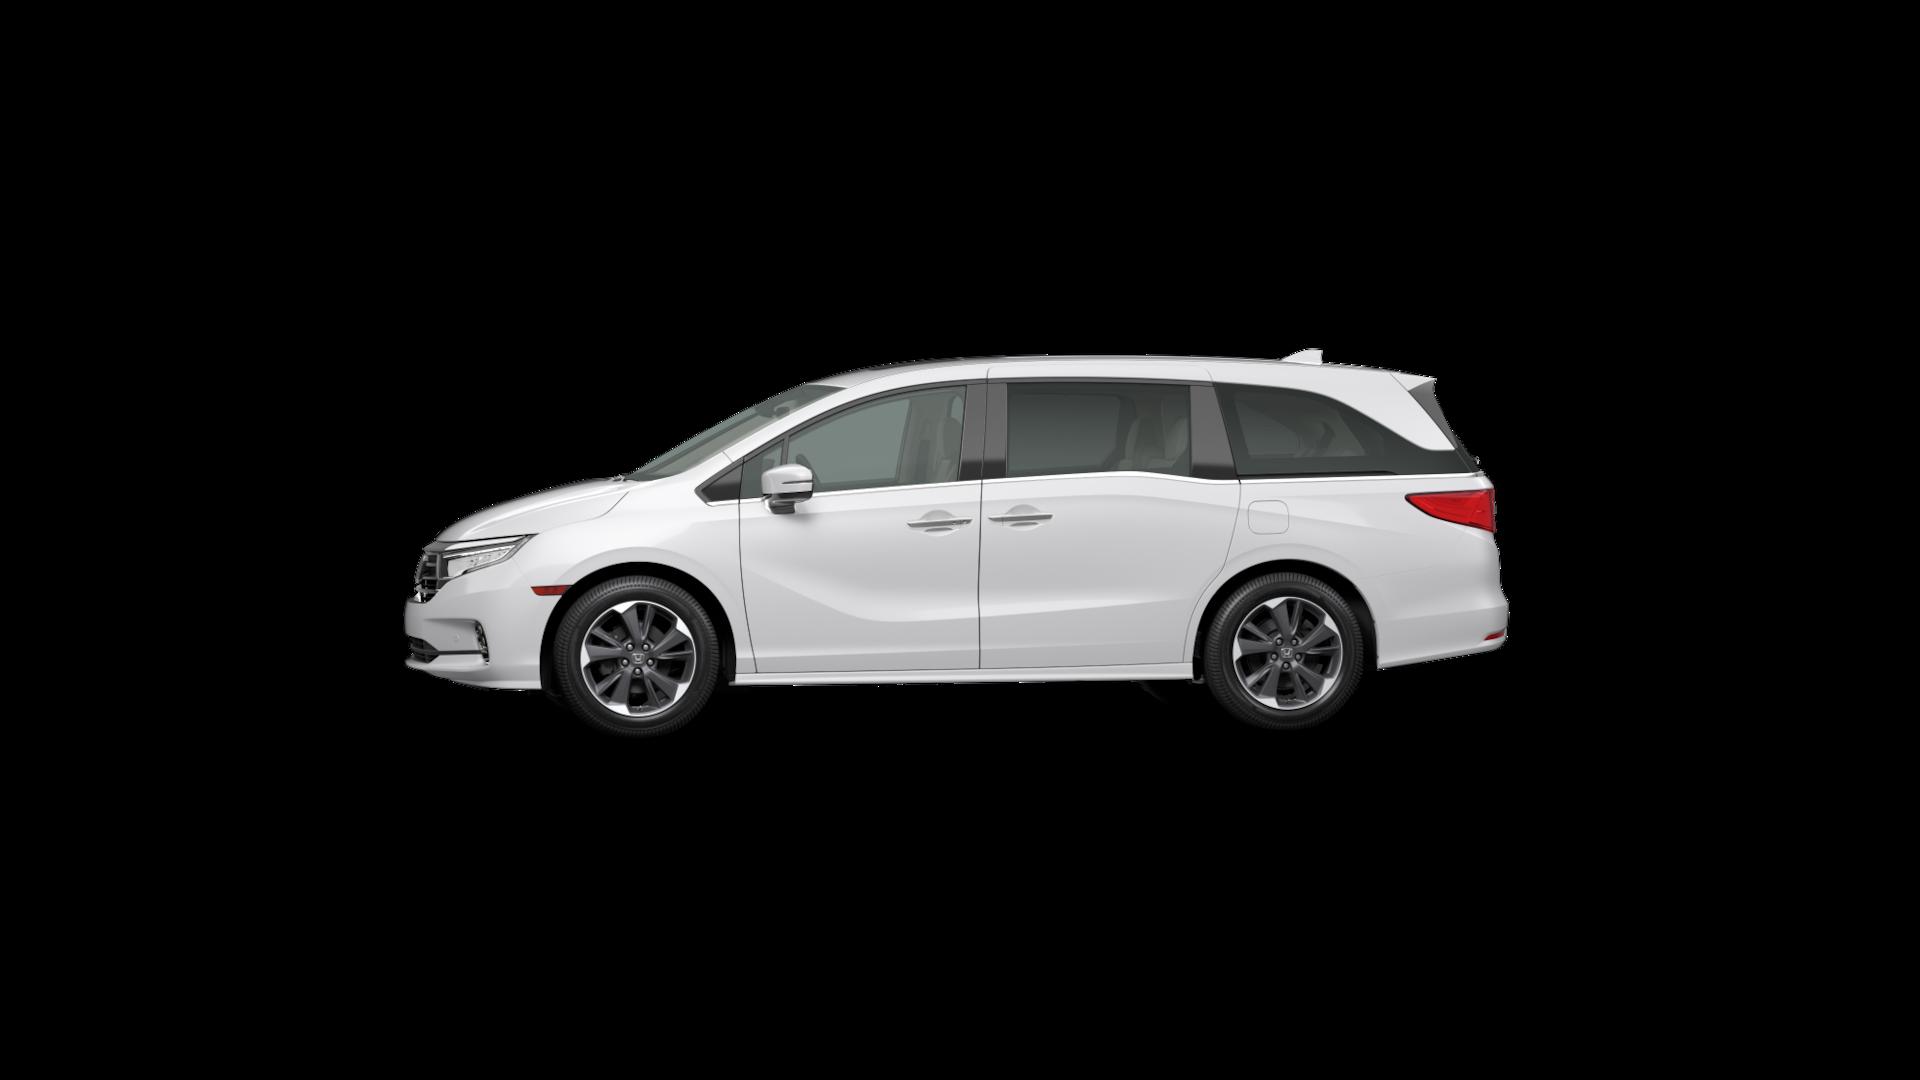 2022 Honda Odyssey The Fun Family Minivan Honda